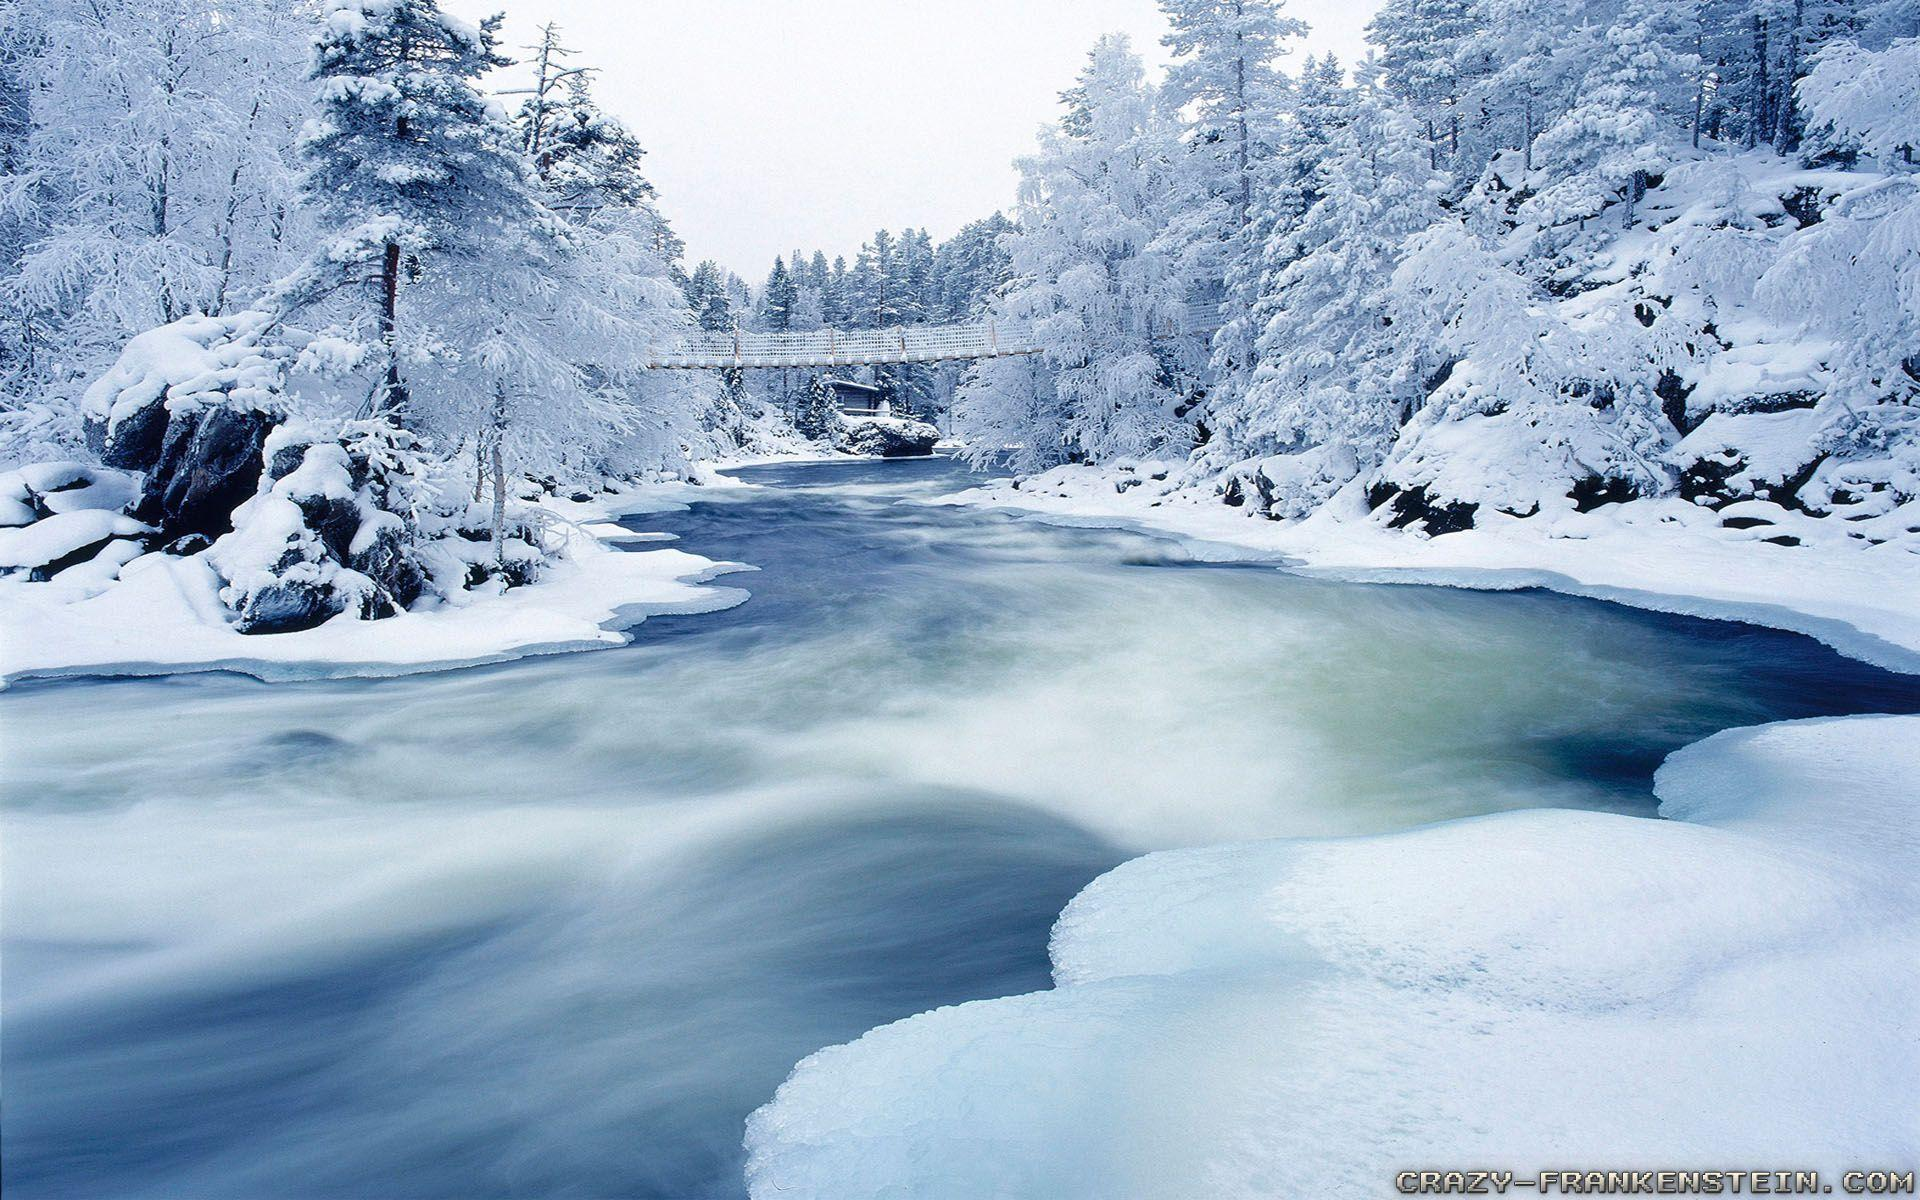 Winter Landscape Wallpapers - Wallpaper Cave